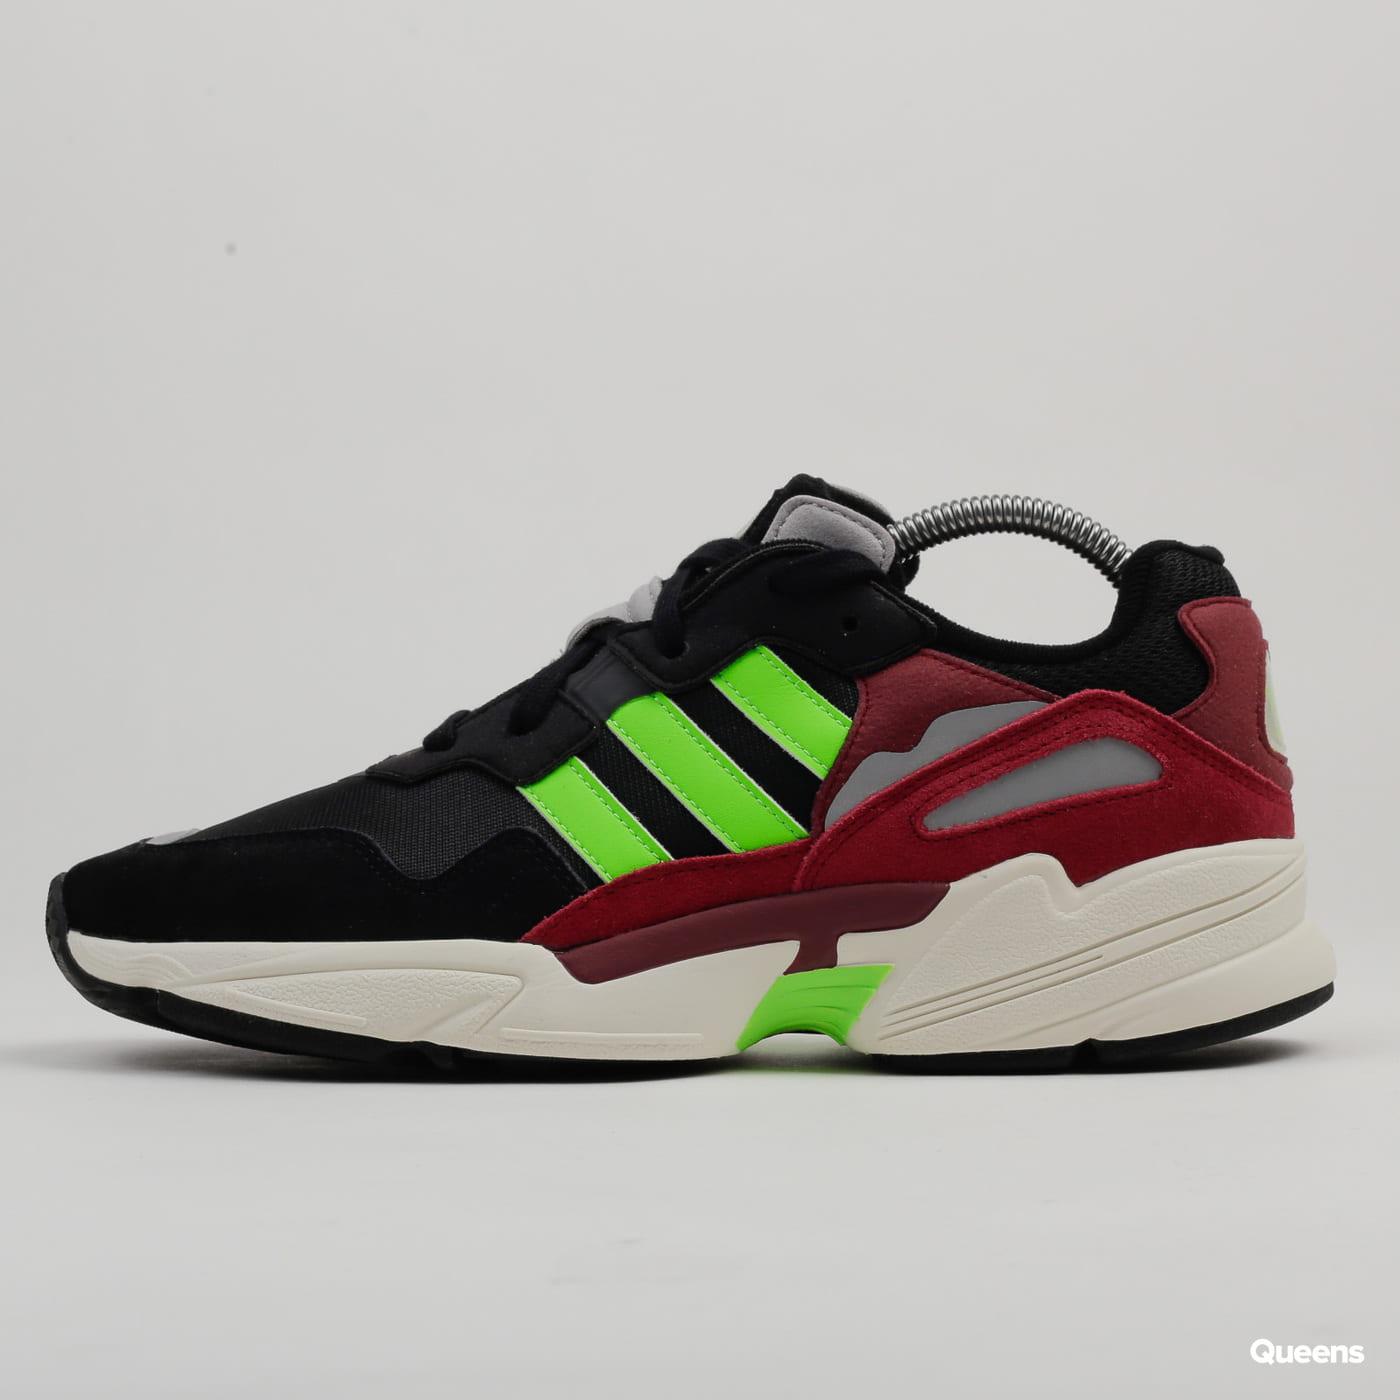 adidas Originals Yung-96 cblack / sgreen / cburgu